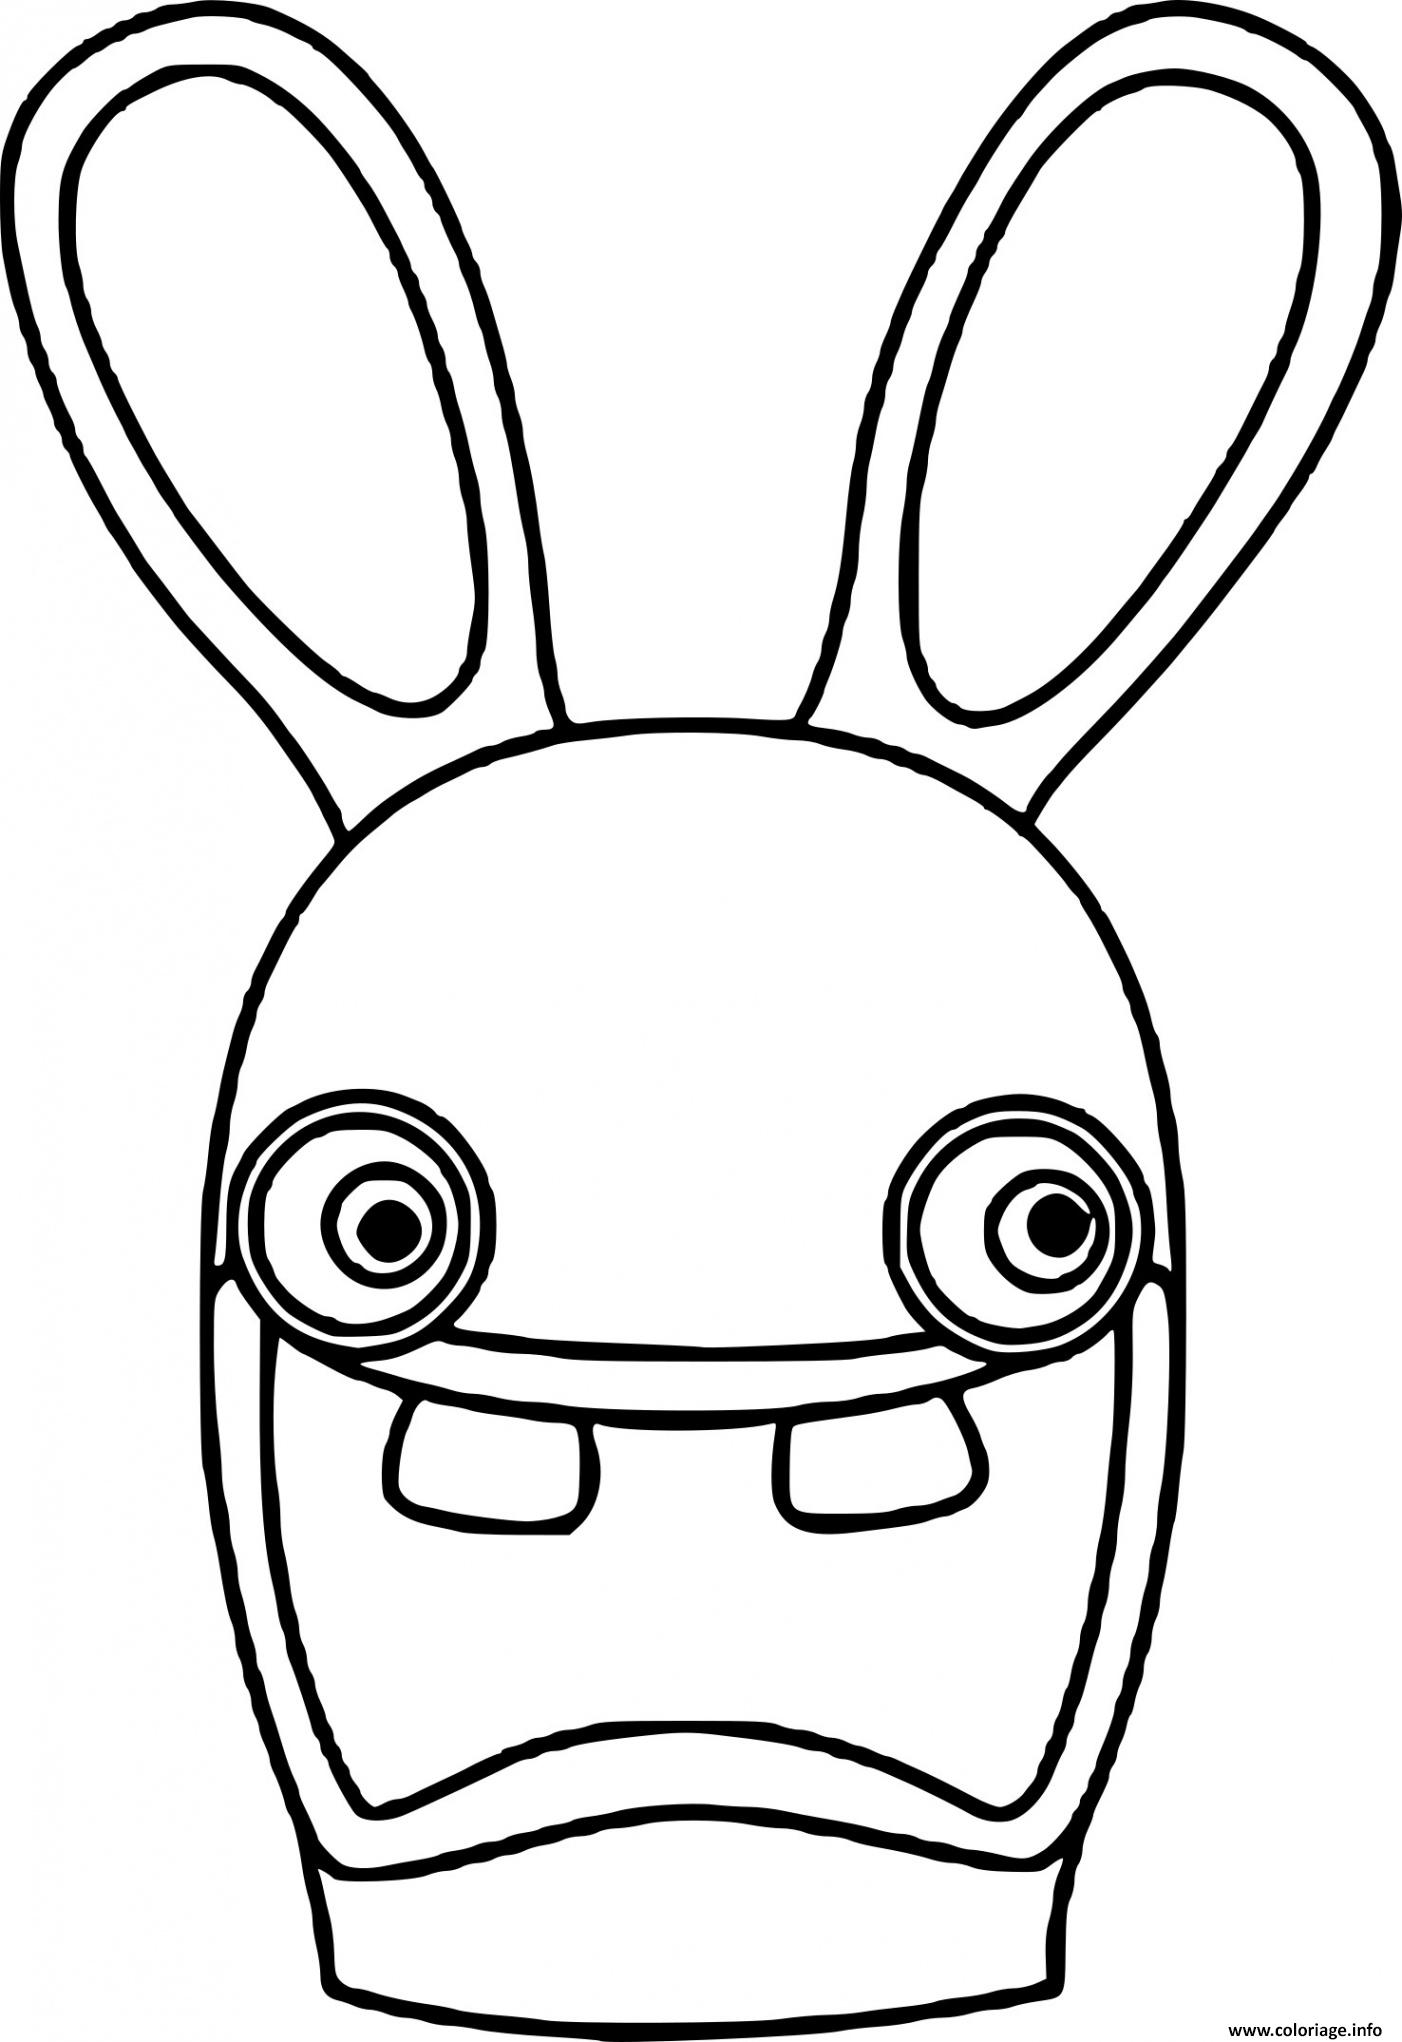 Dessin tete lapin cretin Coloriage Gratuit à Imprimer